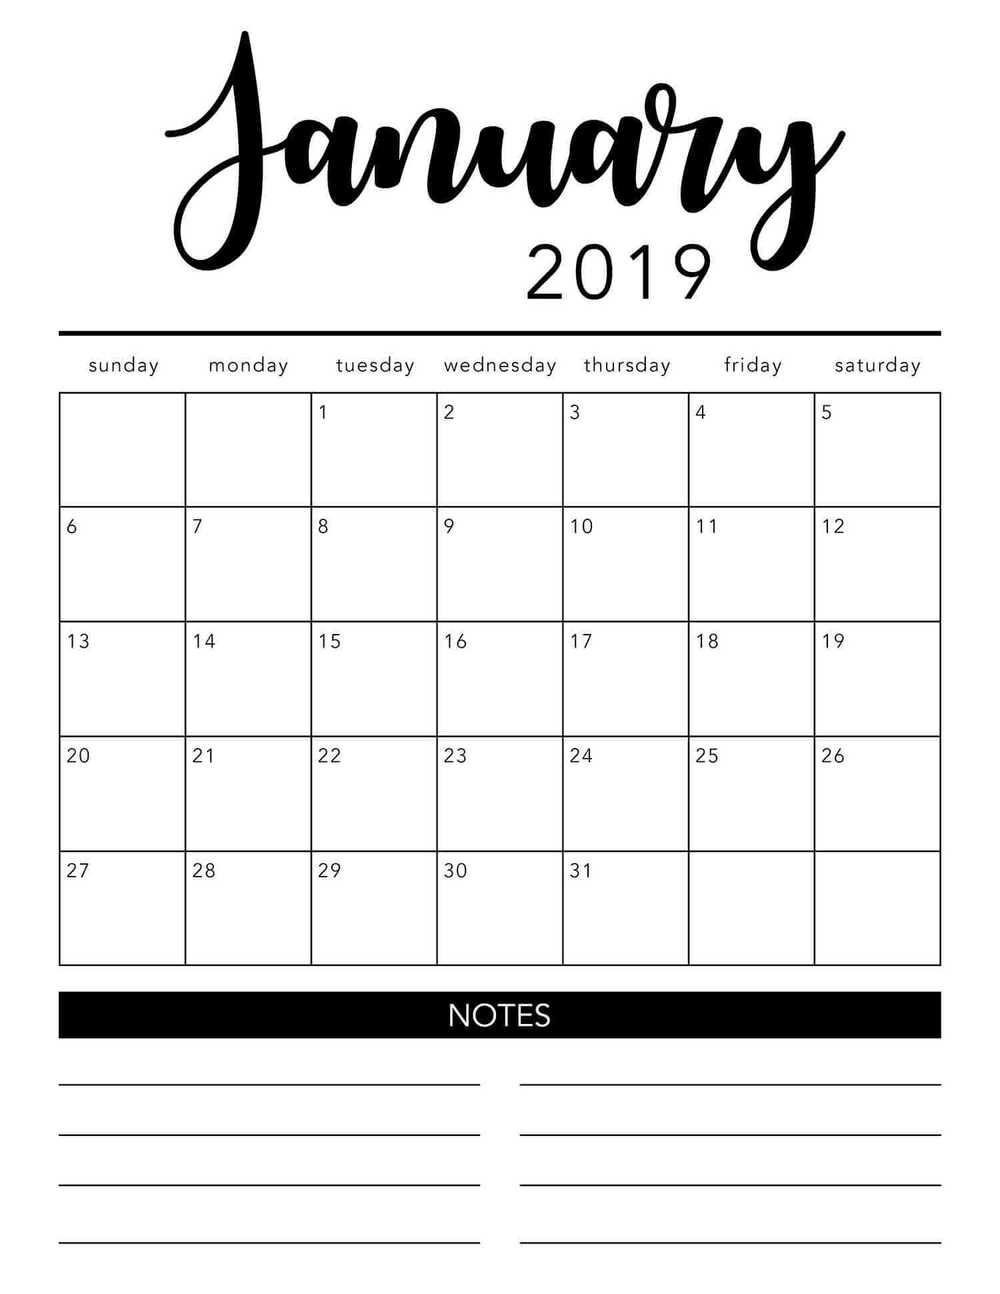 FREE 2019 Printable Calendar Template 2 colors I